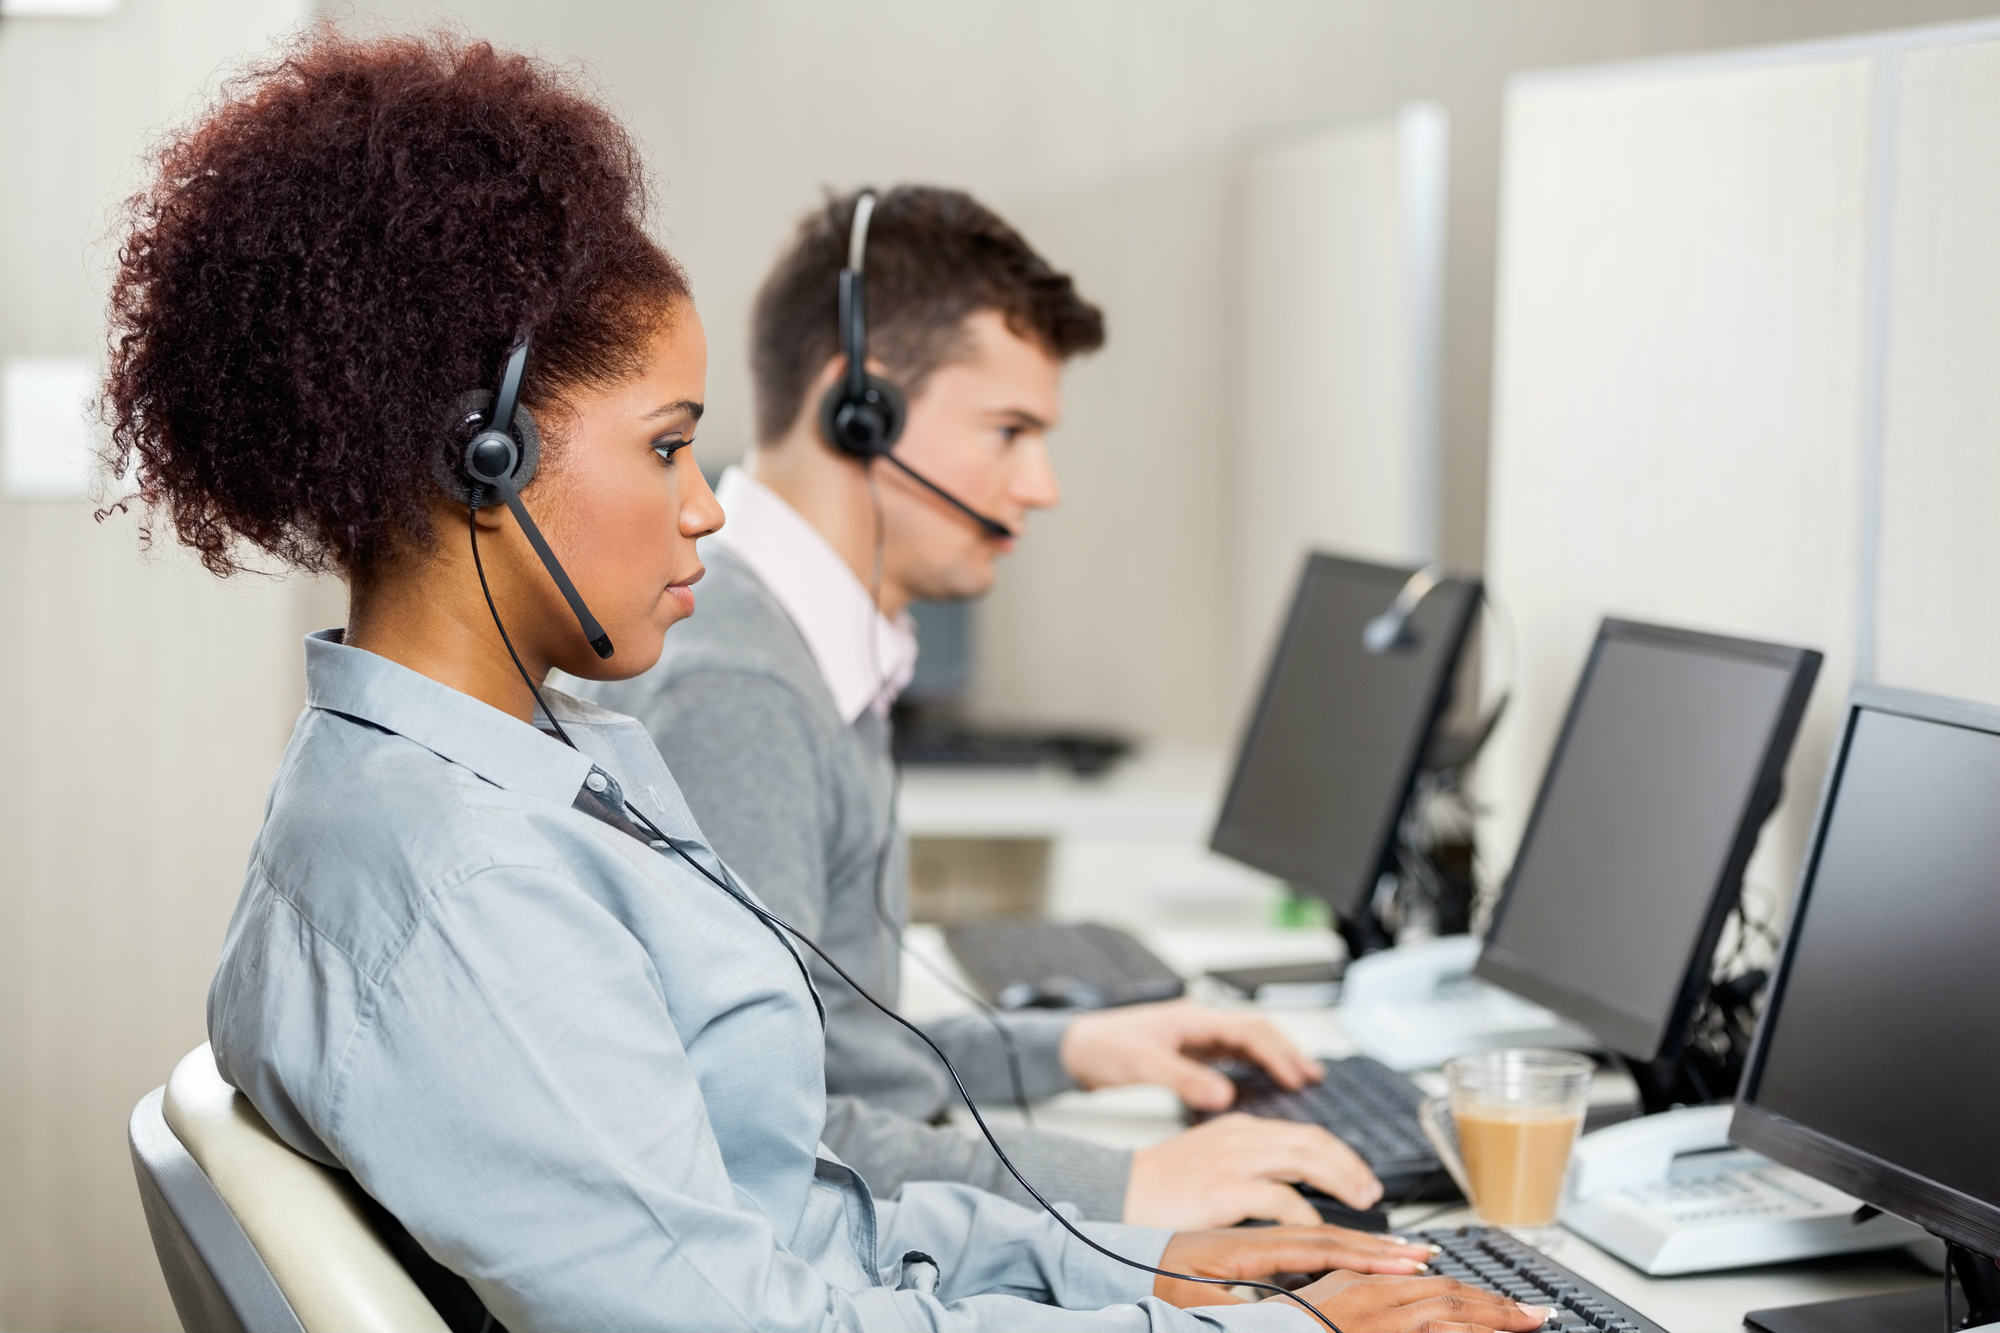 Reconocido a los trabajadores de 'contact center' a parar cinco minutos por cada hora